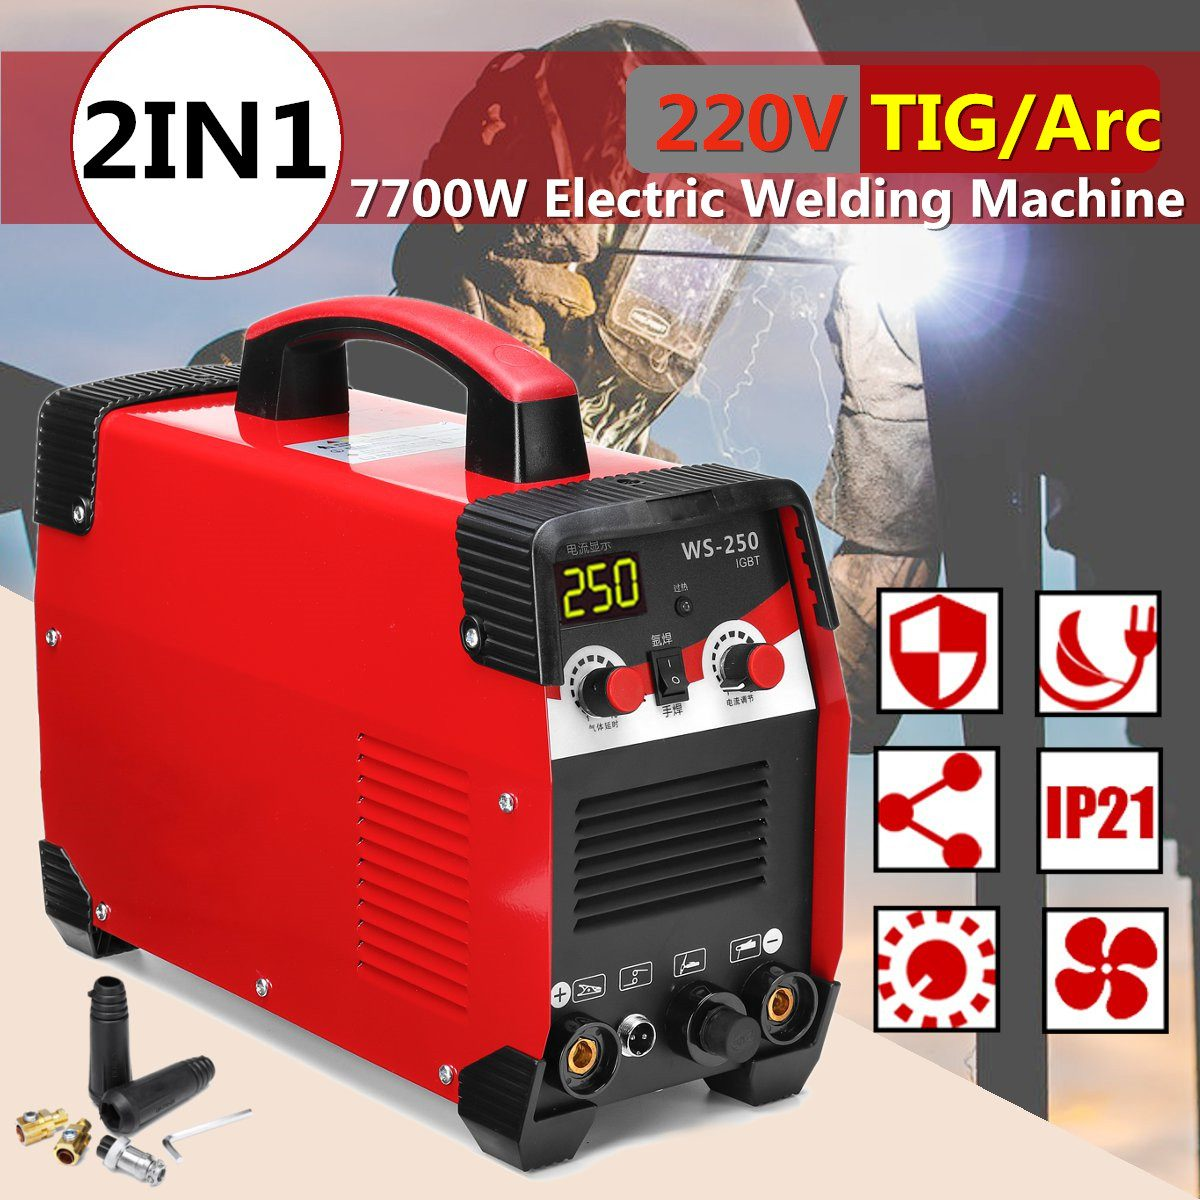 220v 7700w 20-250a tig/soldador a arco máquina de solda elétrica inversor da vara de mma igbt para ferramentas elétricas da máquina de soldadura da tarefa de soldadura